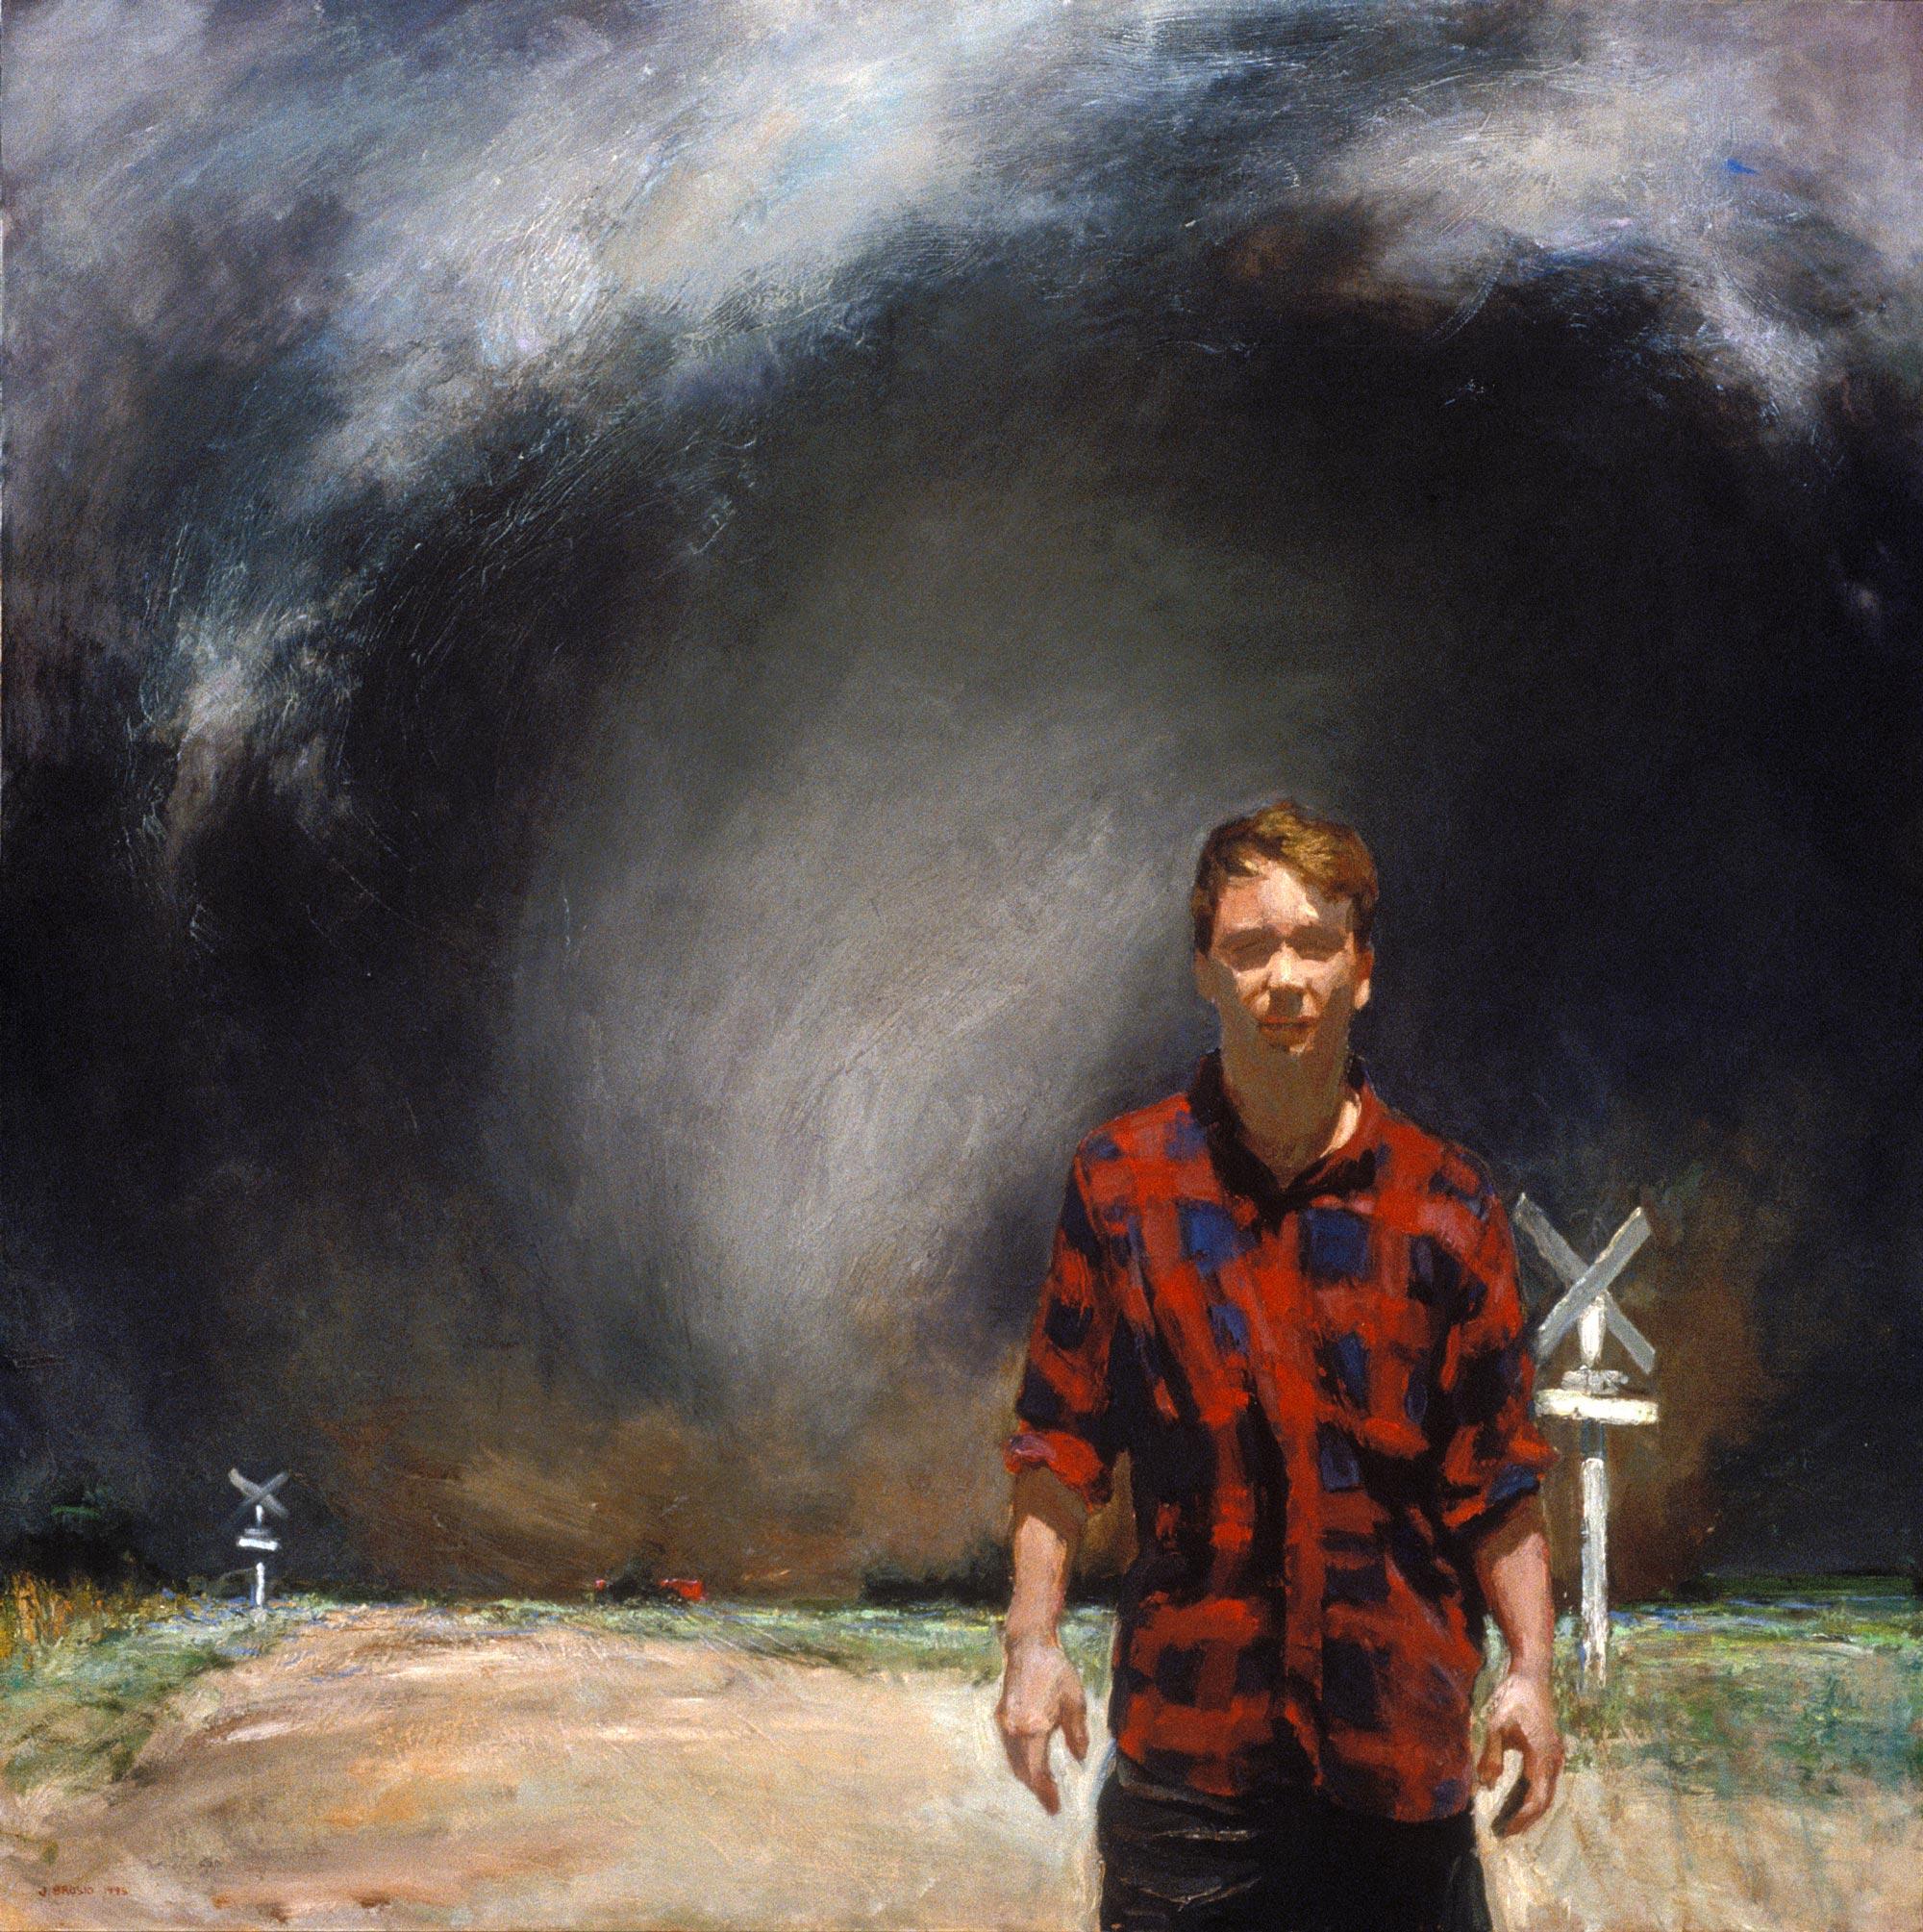 Harbinger (Self-Portrait), 48 x 48, oil on canvas, 1995